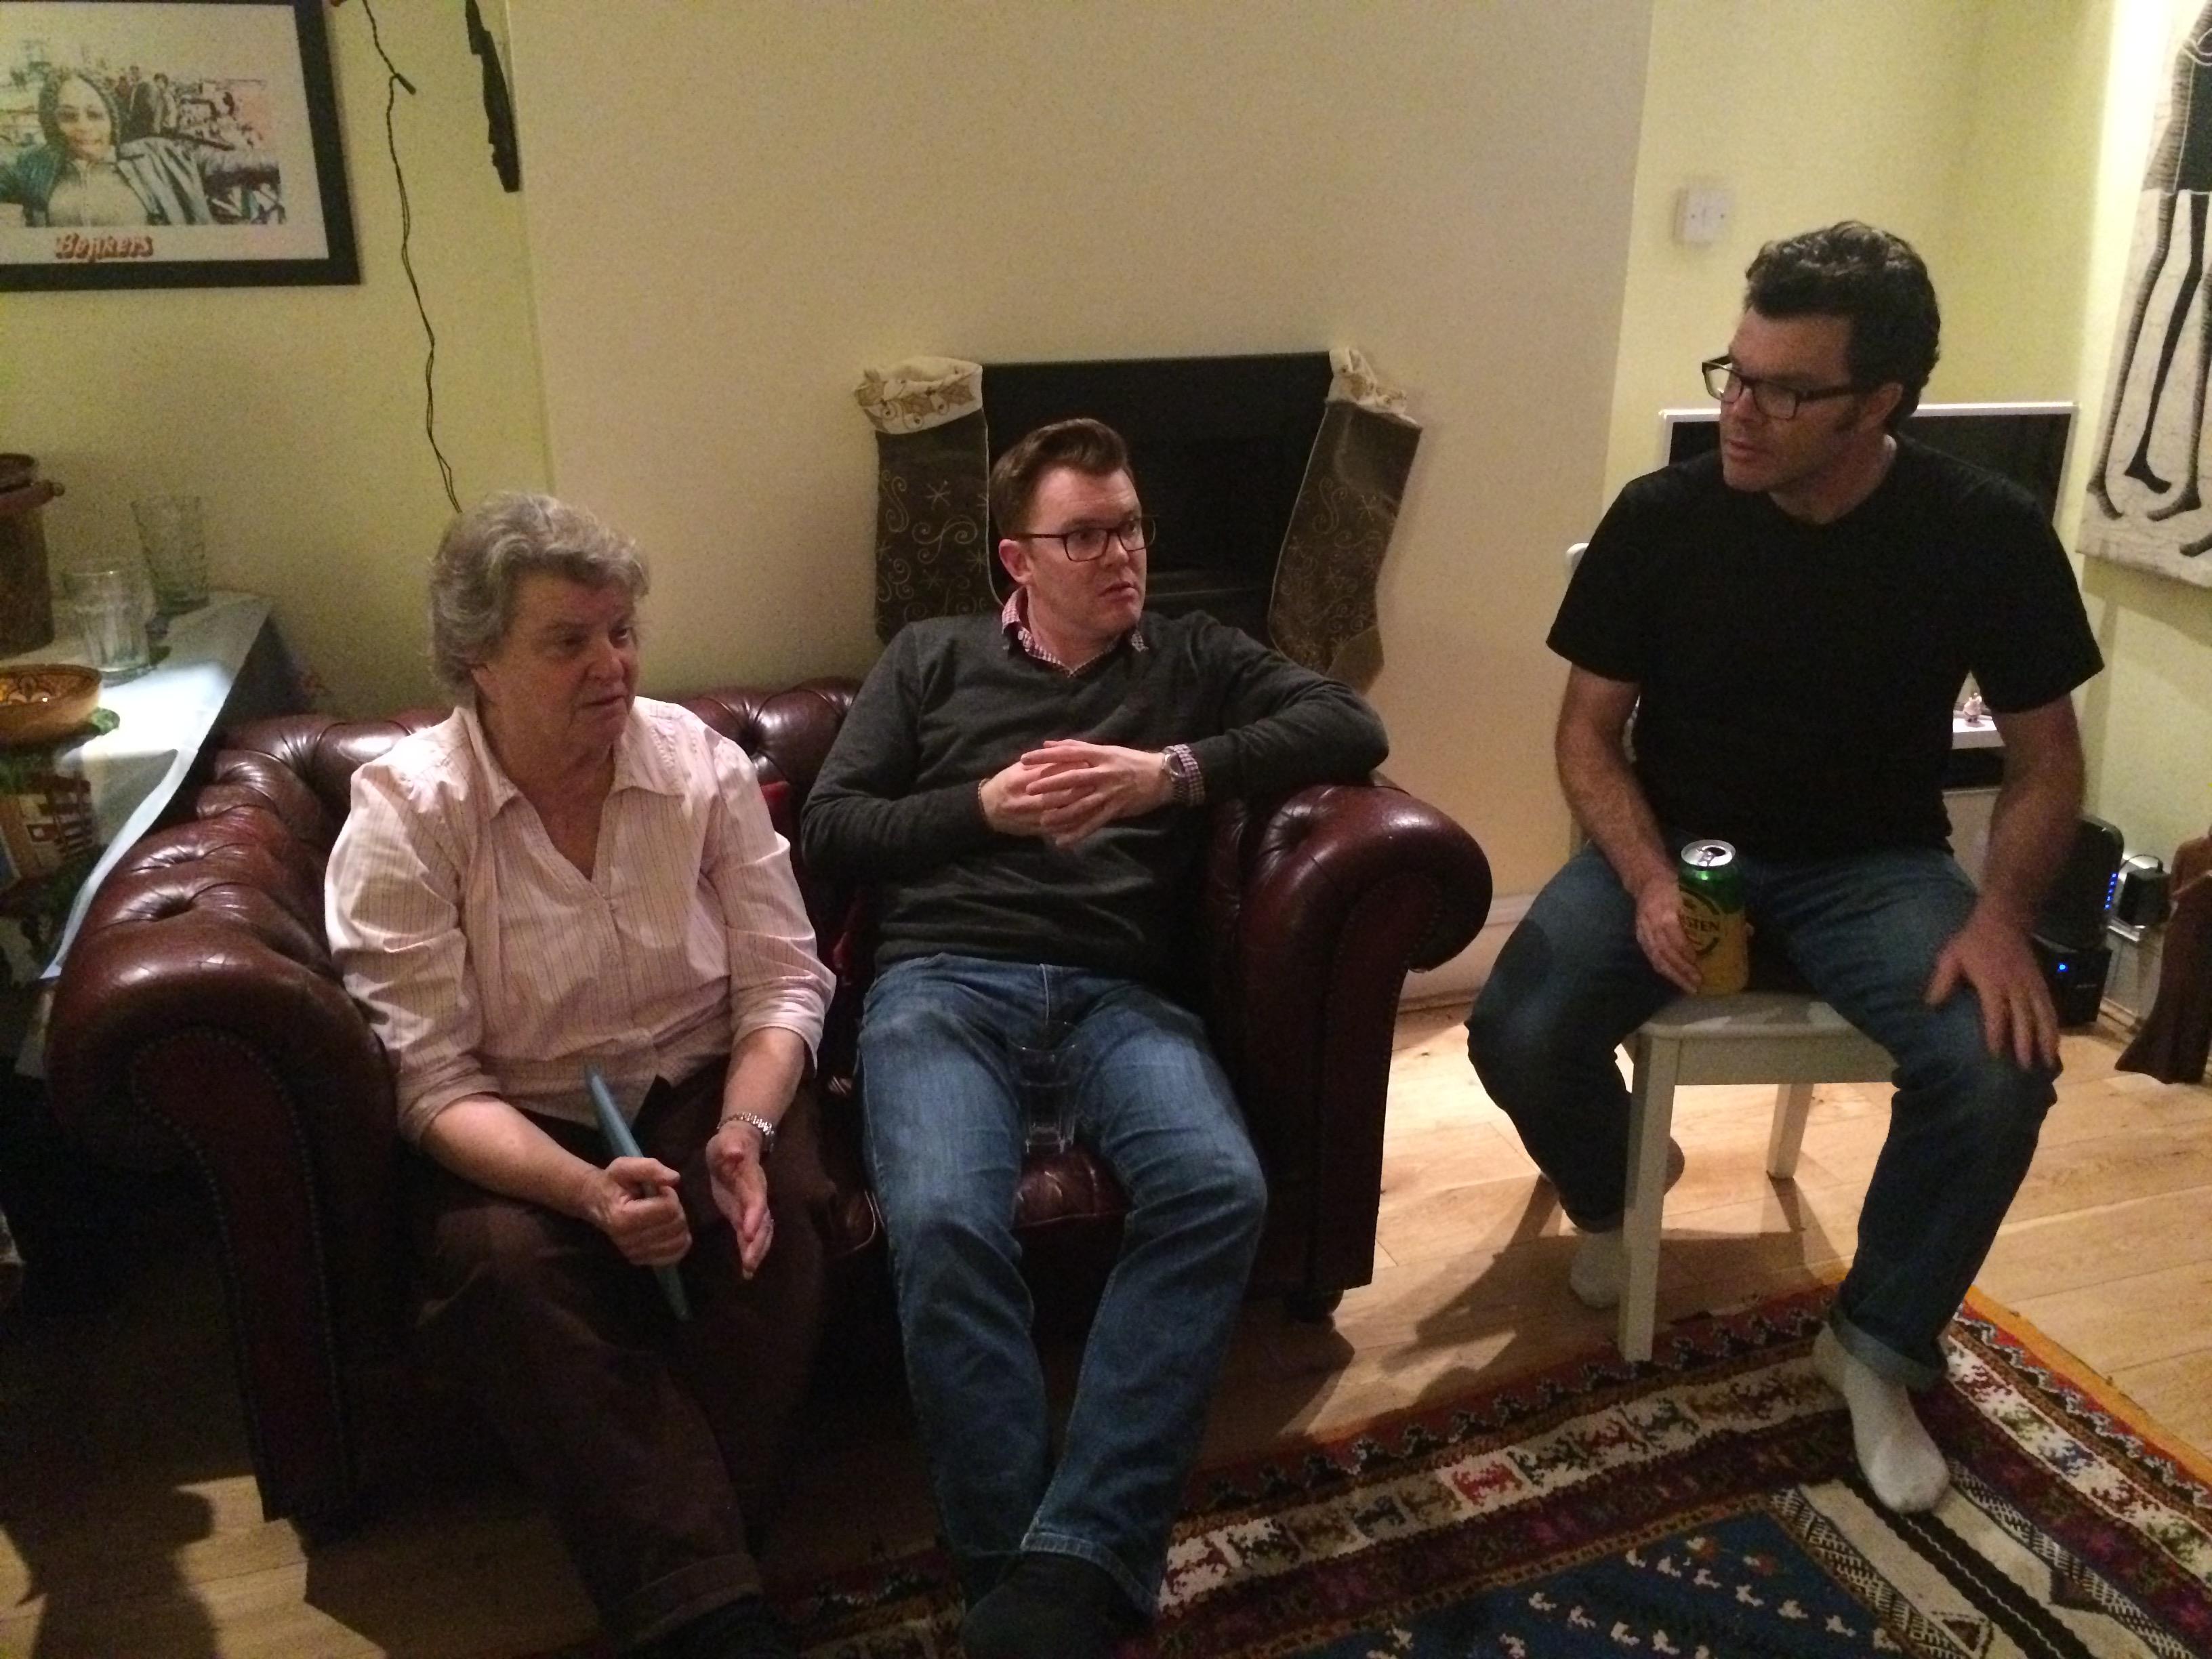 Lori, Ed and Russel Shearer